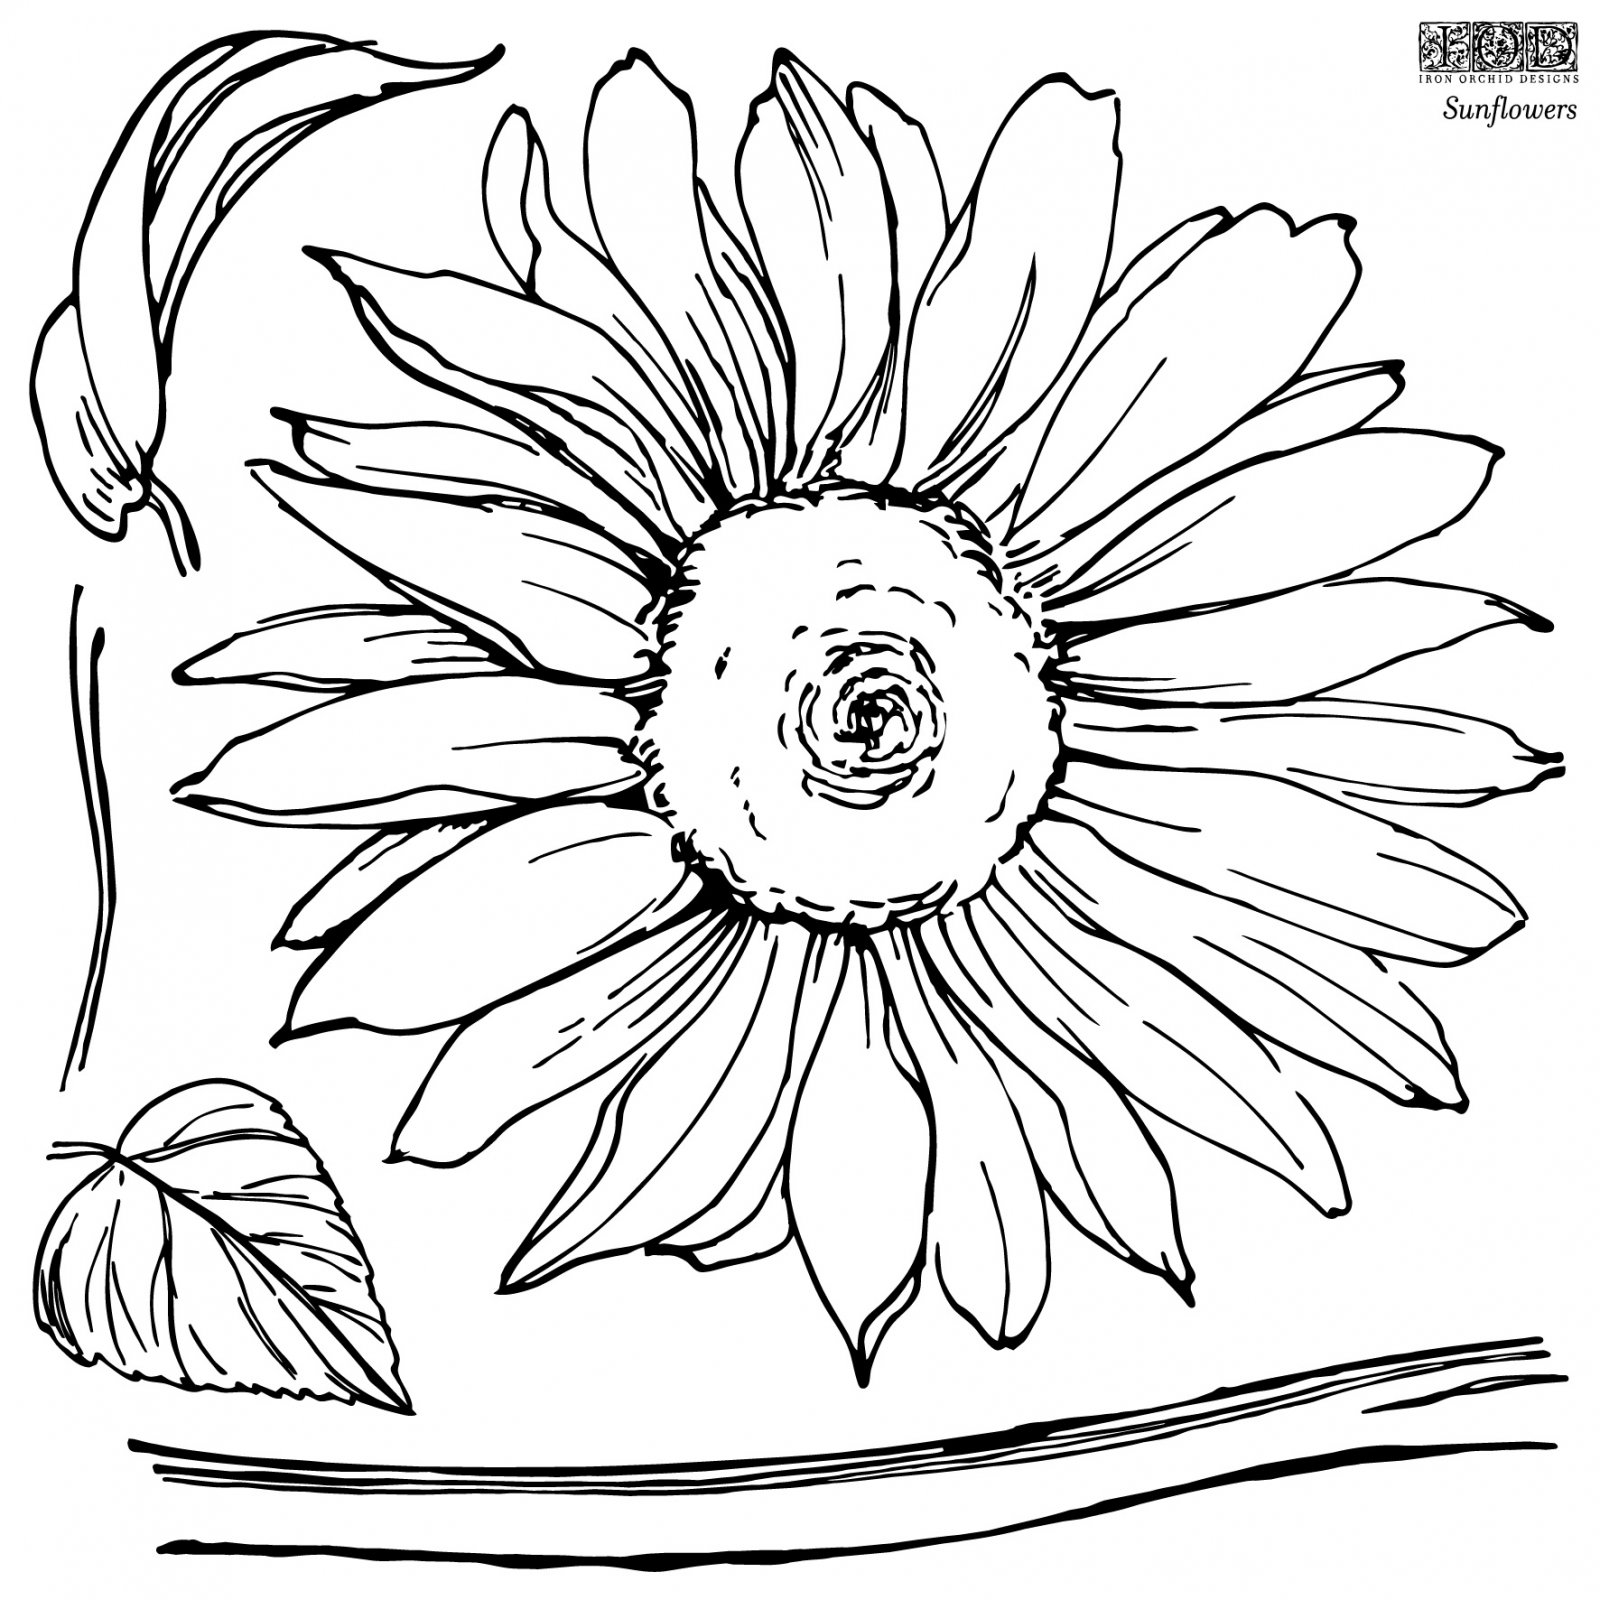 Sunflowers 12×12 IOD Stamp